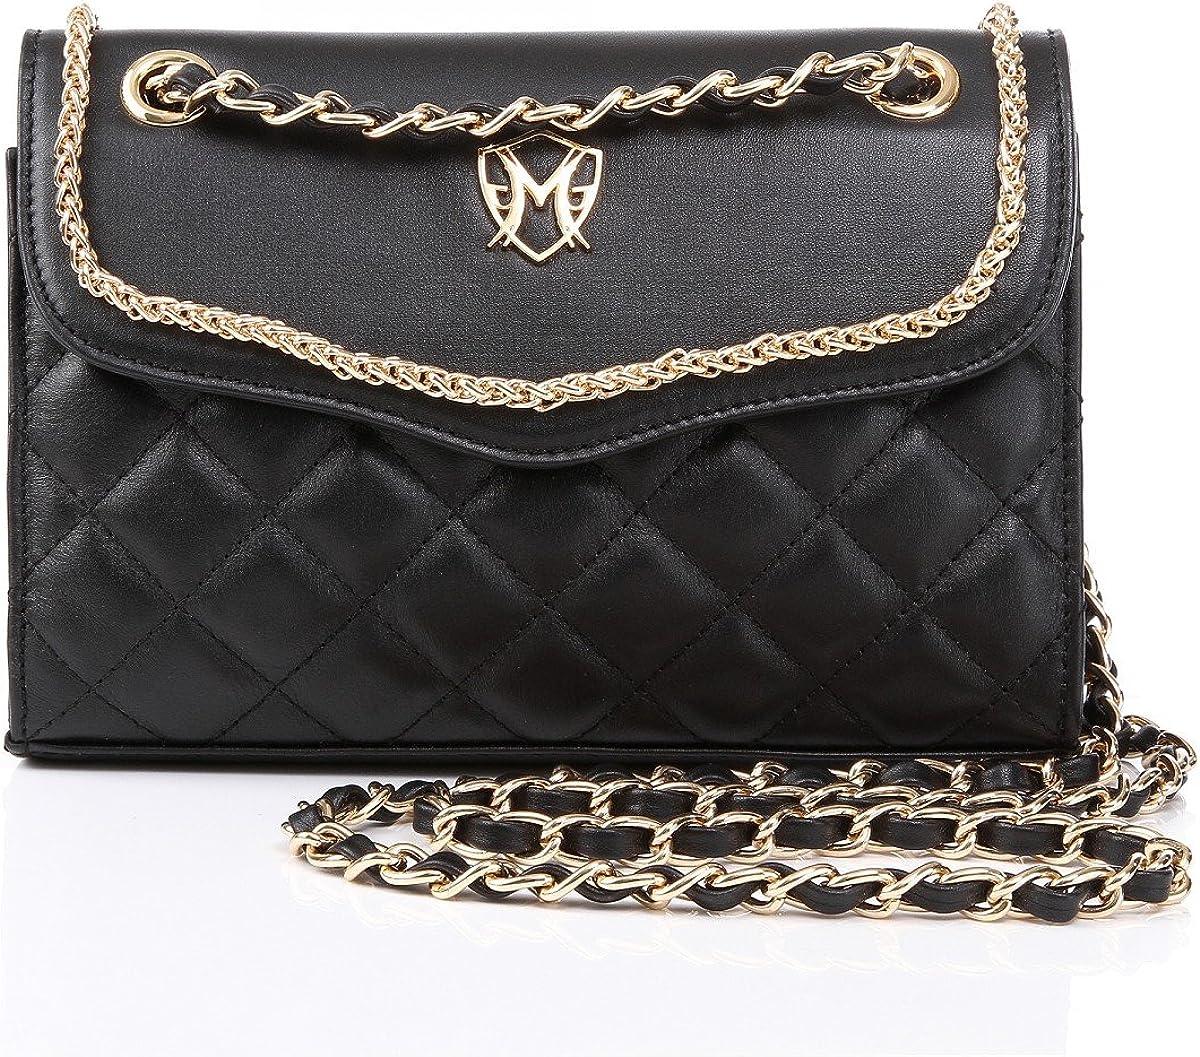 Natalie Real Nappa Leather Shoulder Greg Purse by Free shipping on posting reviews Handbag Michae Sales